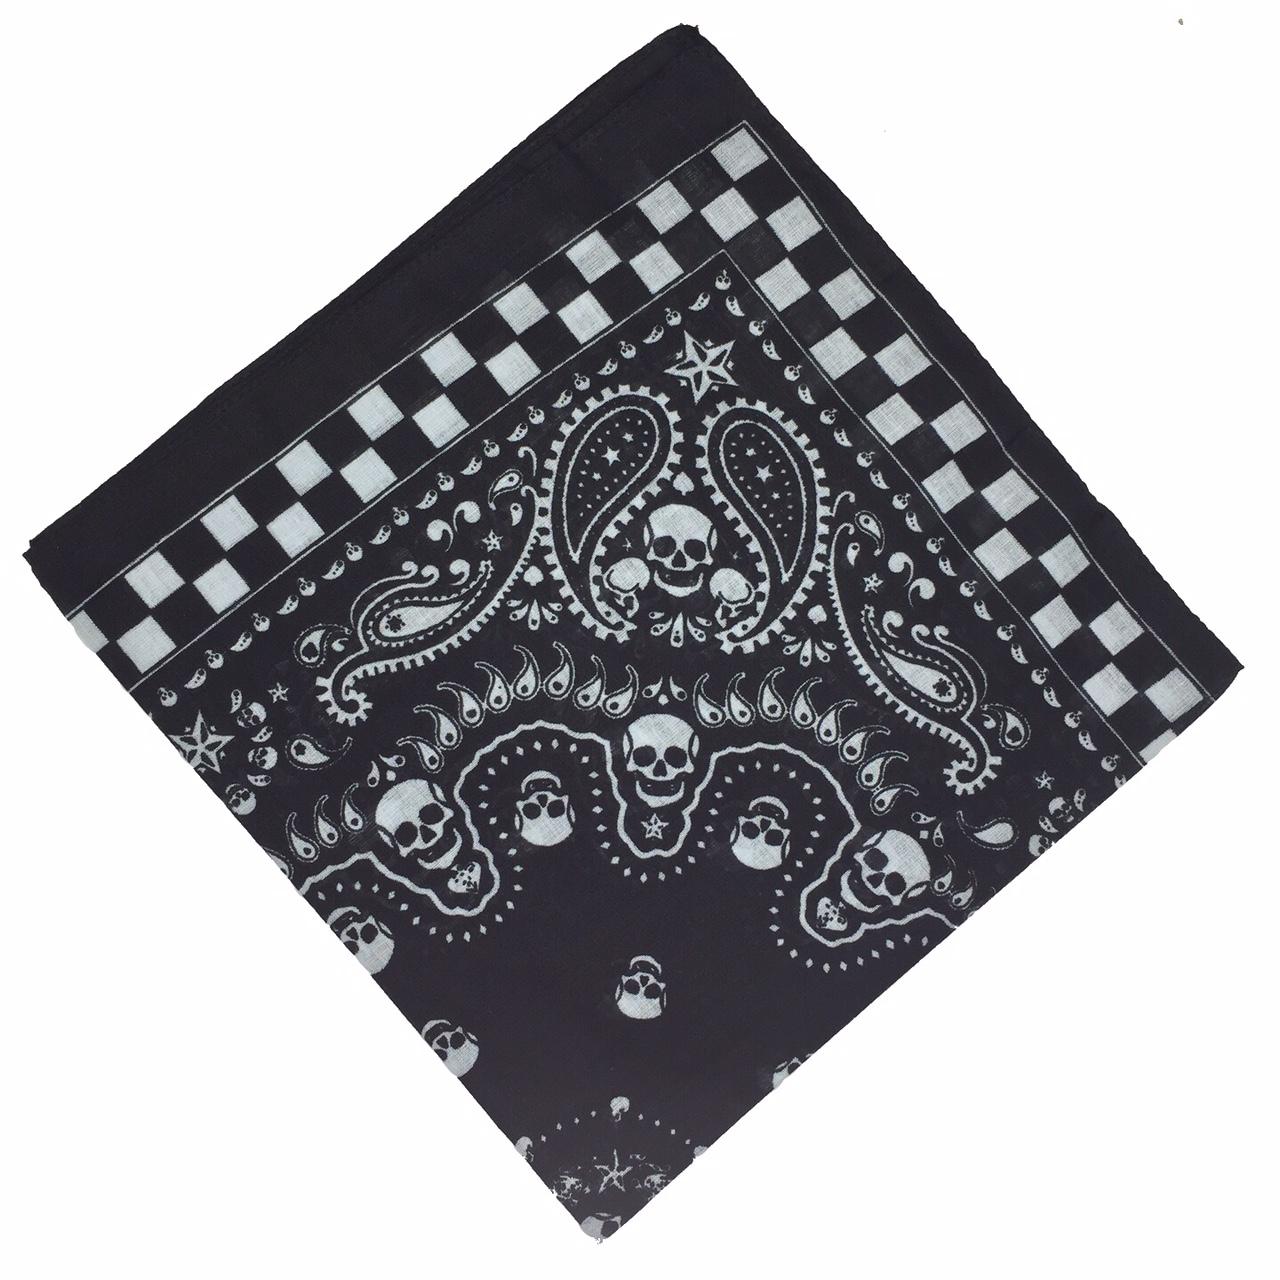 100-Cotton-Paisley-Bandana-Bandanna-Headwear-Scarf-Neck-Wrist-Wrap-Band-Headtie thumbnail 117